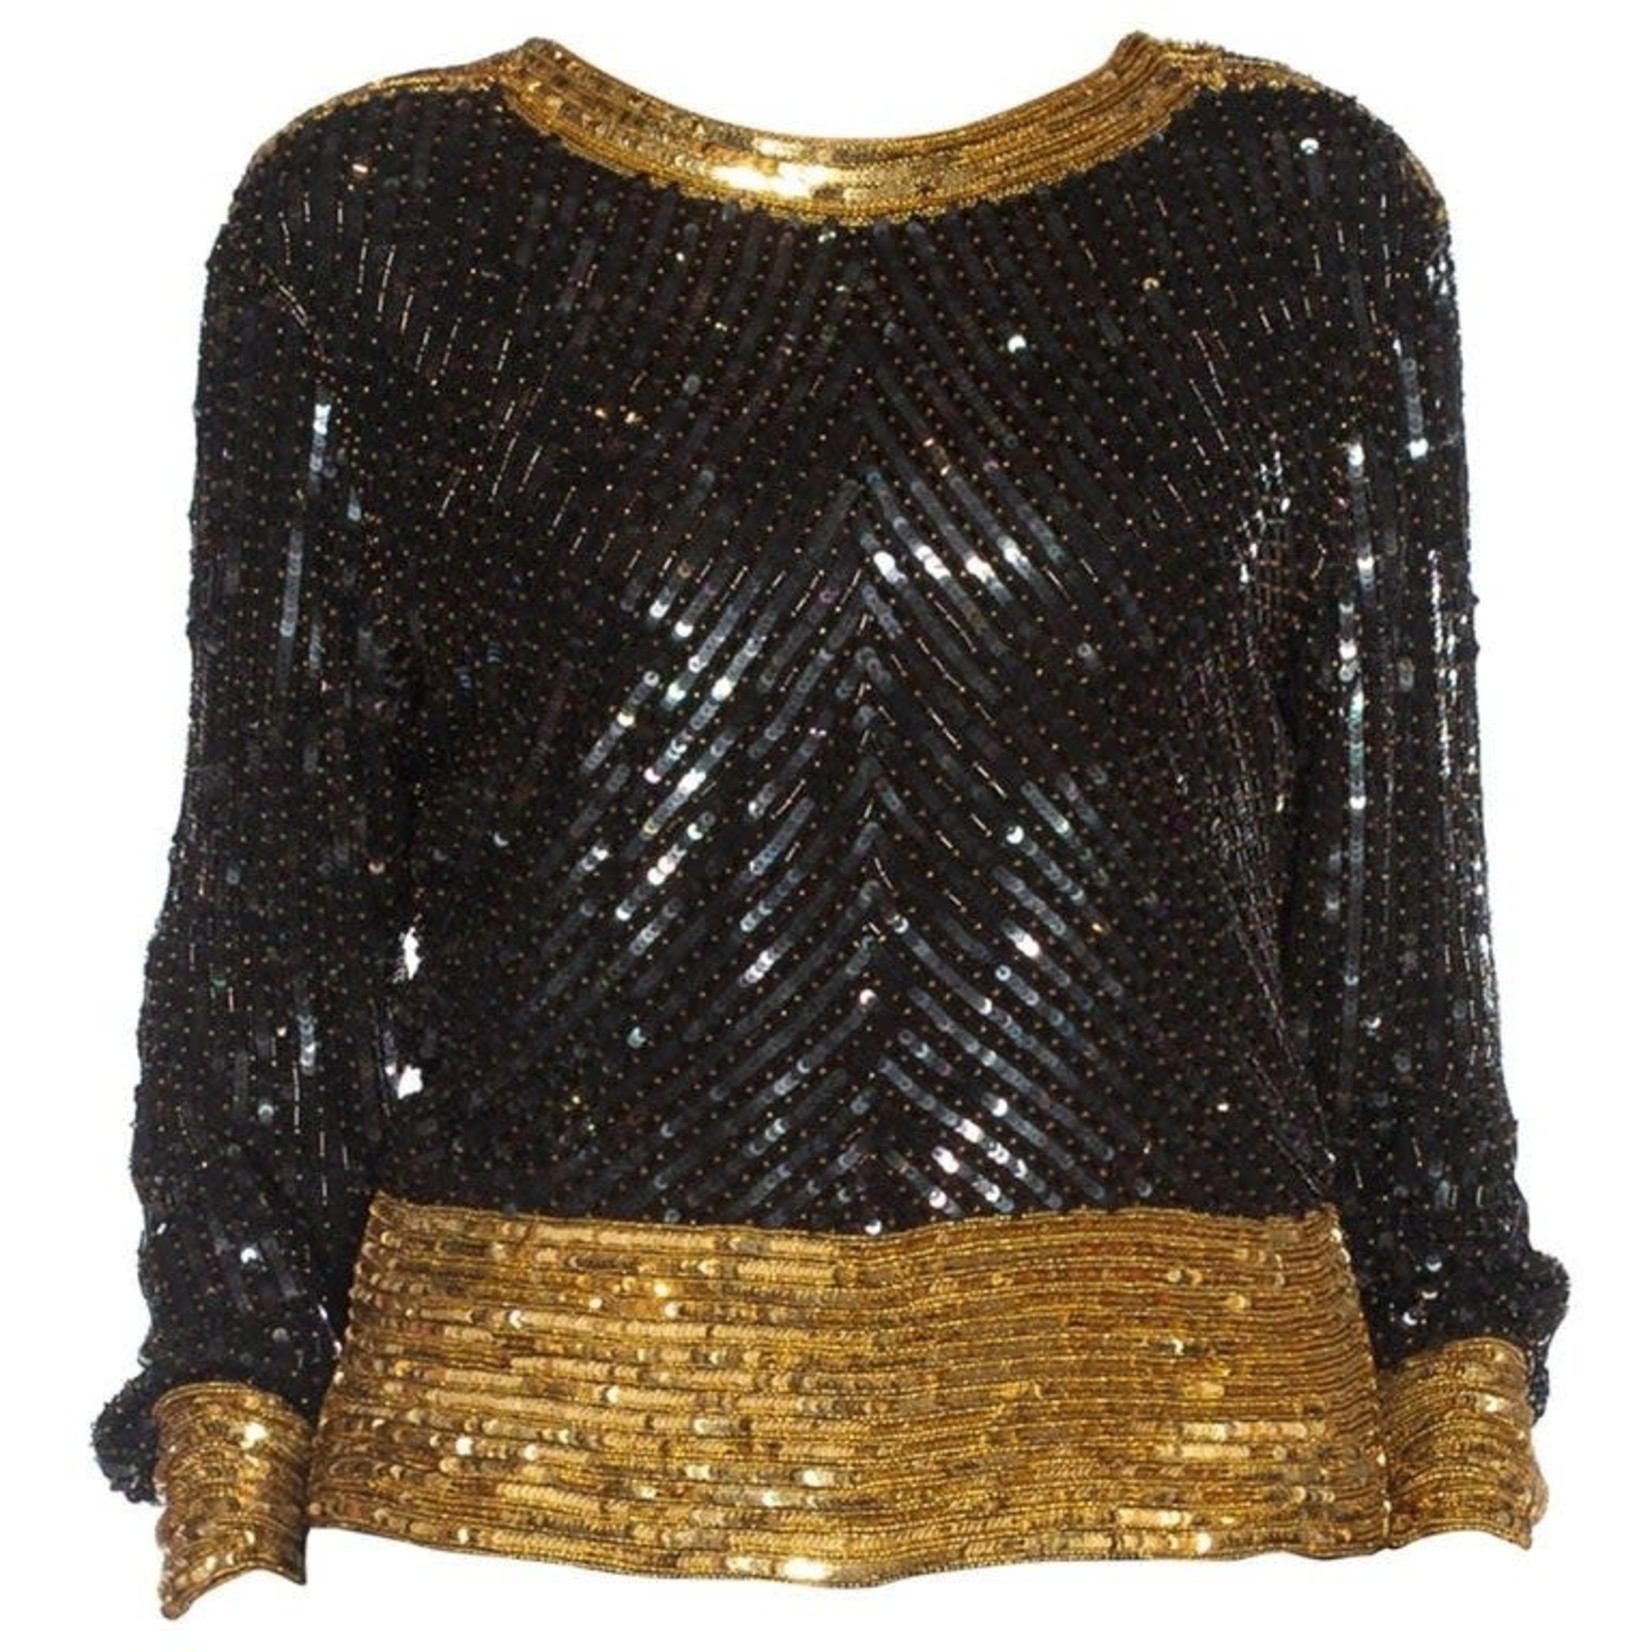 Wyld Blue Vintage 1980s SAINT LAURENT RIVE GAUCHE Black & Gold Silk Chiffon Beaded Top DSBT9ON43086